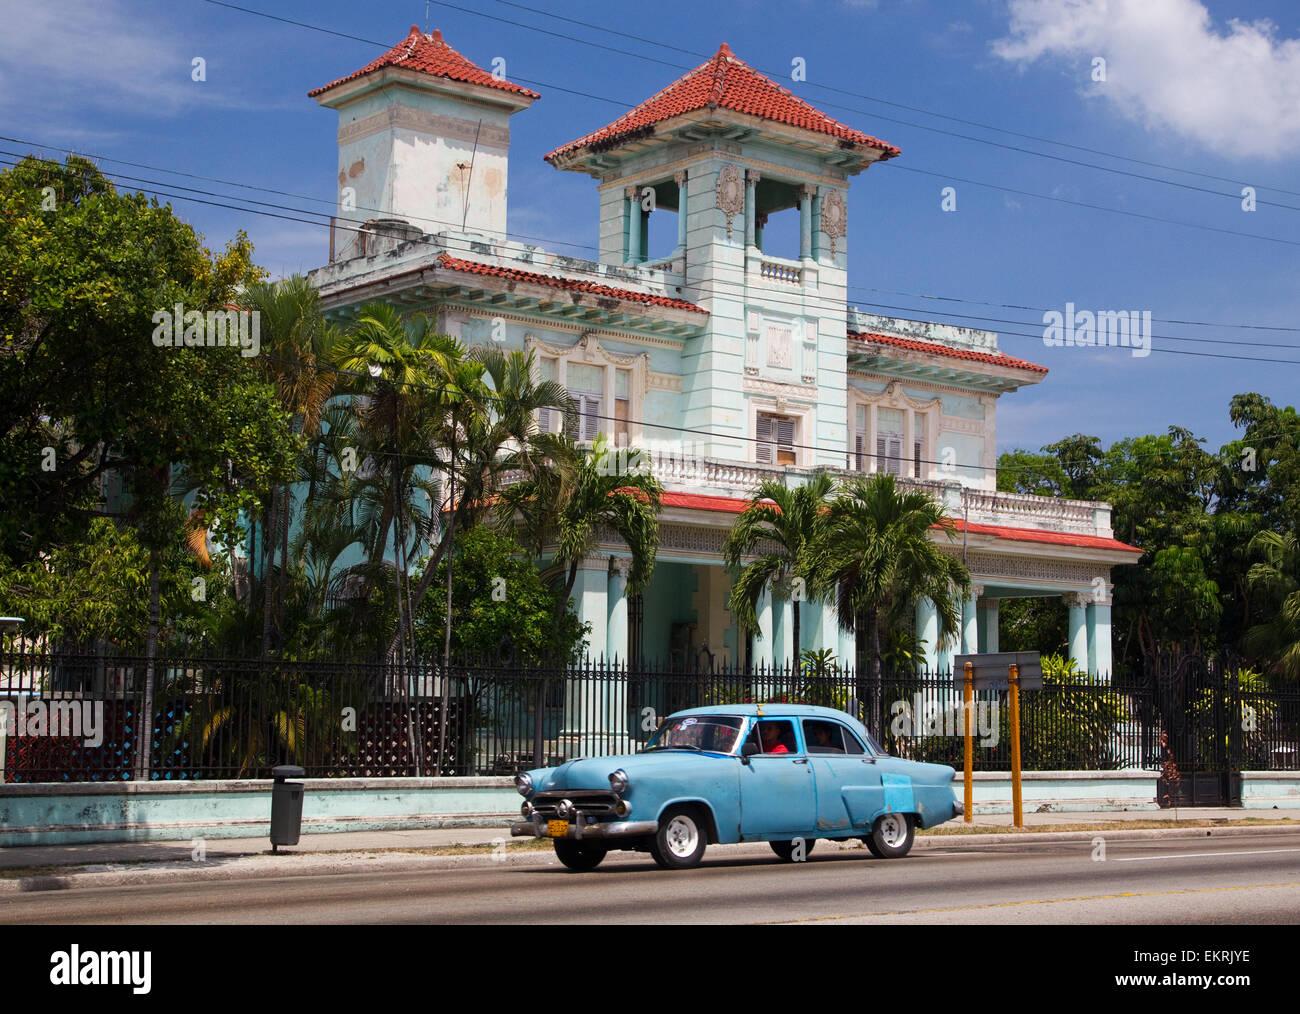 Un classique american retro automobile passe une villa de style colonial à La Havane Photo Stock